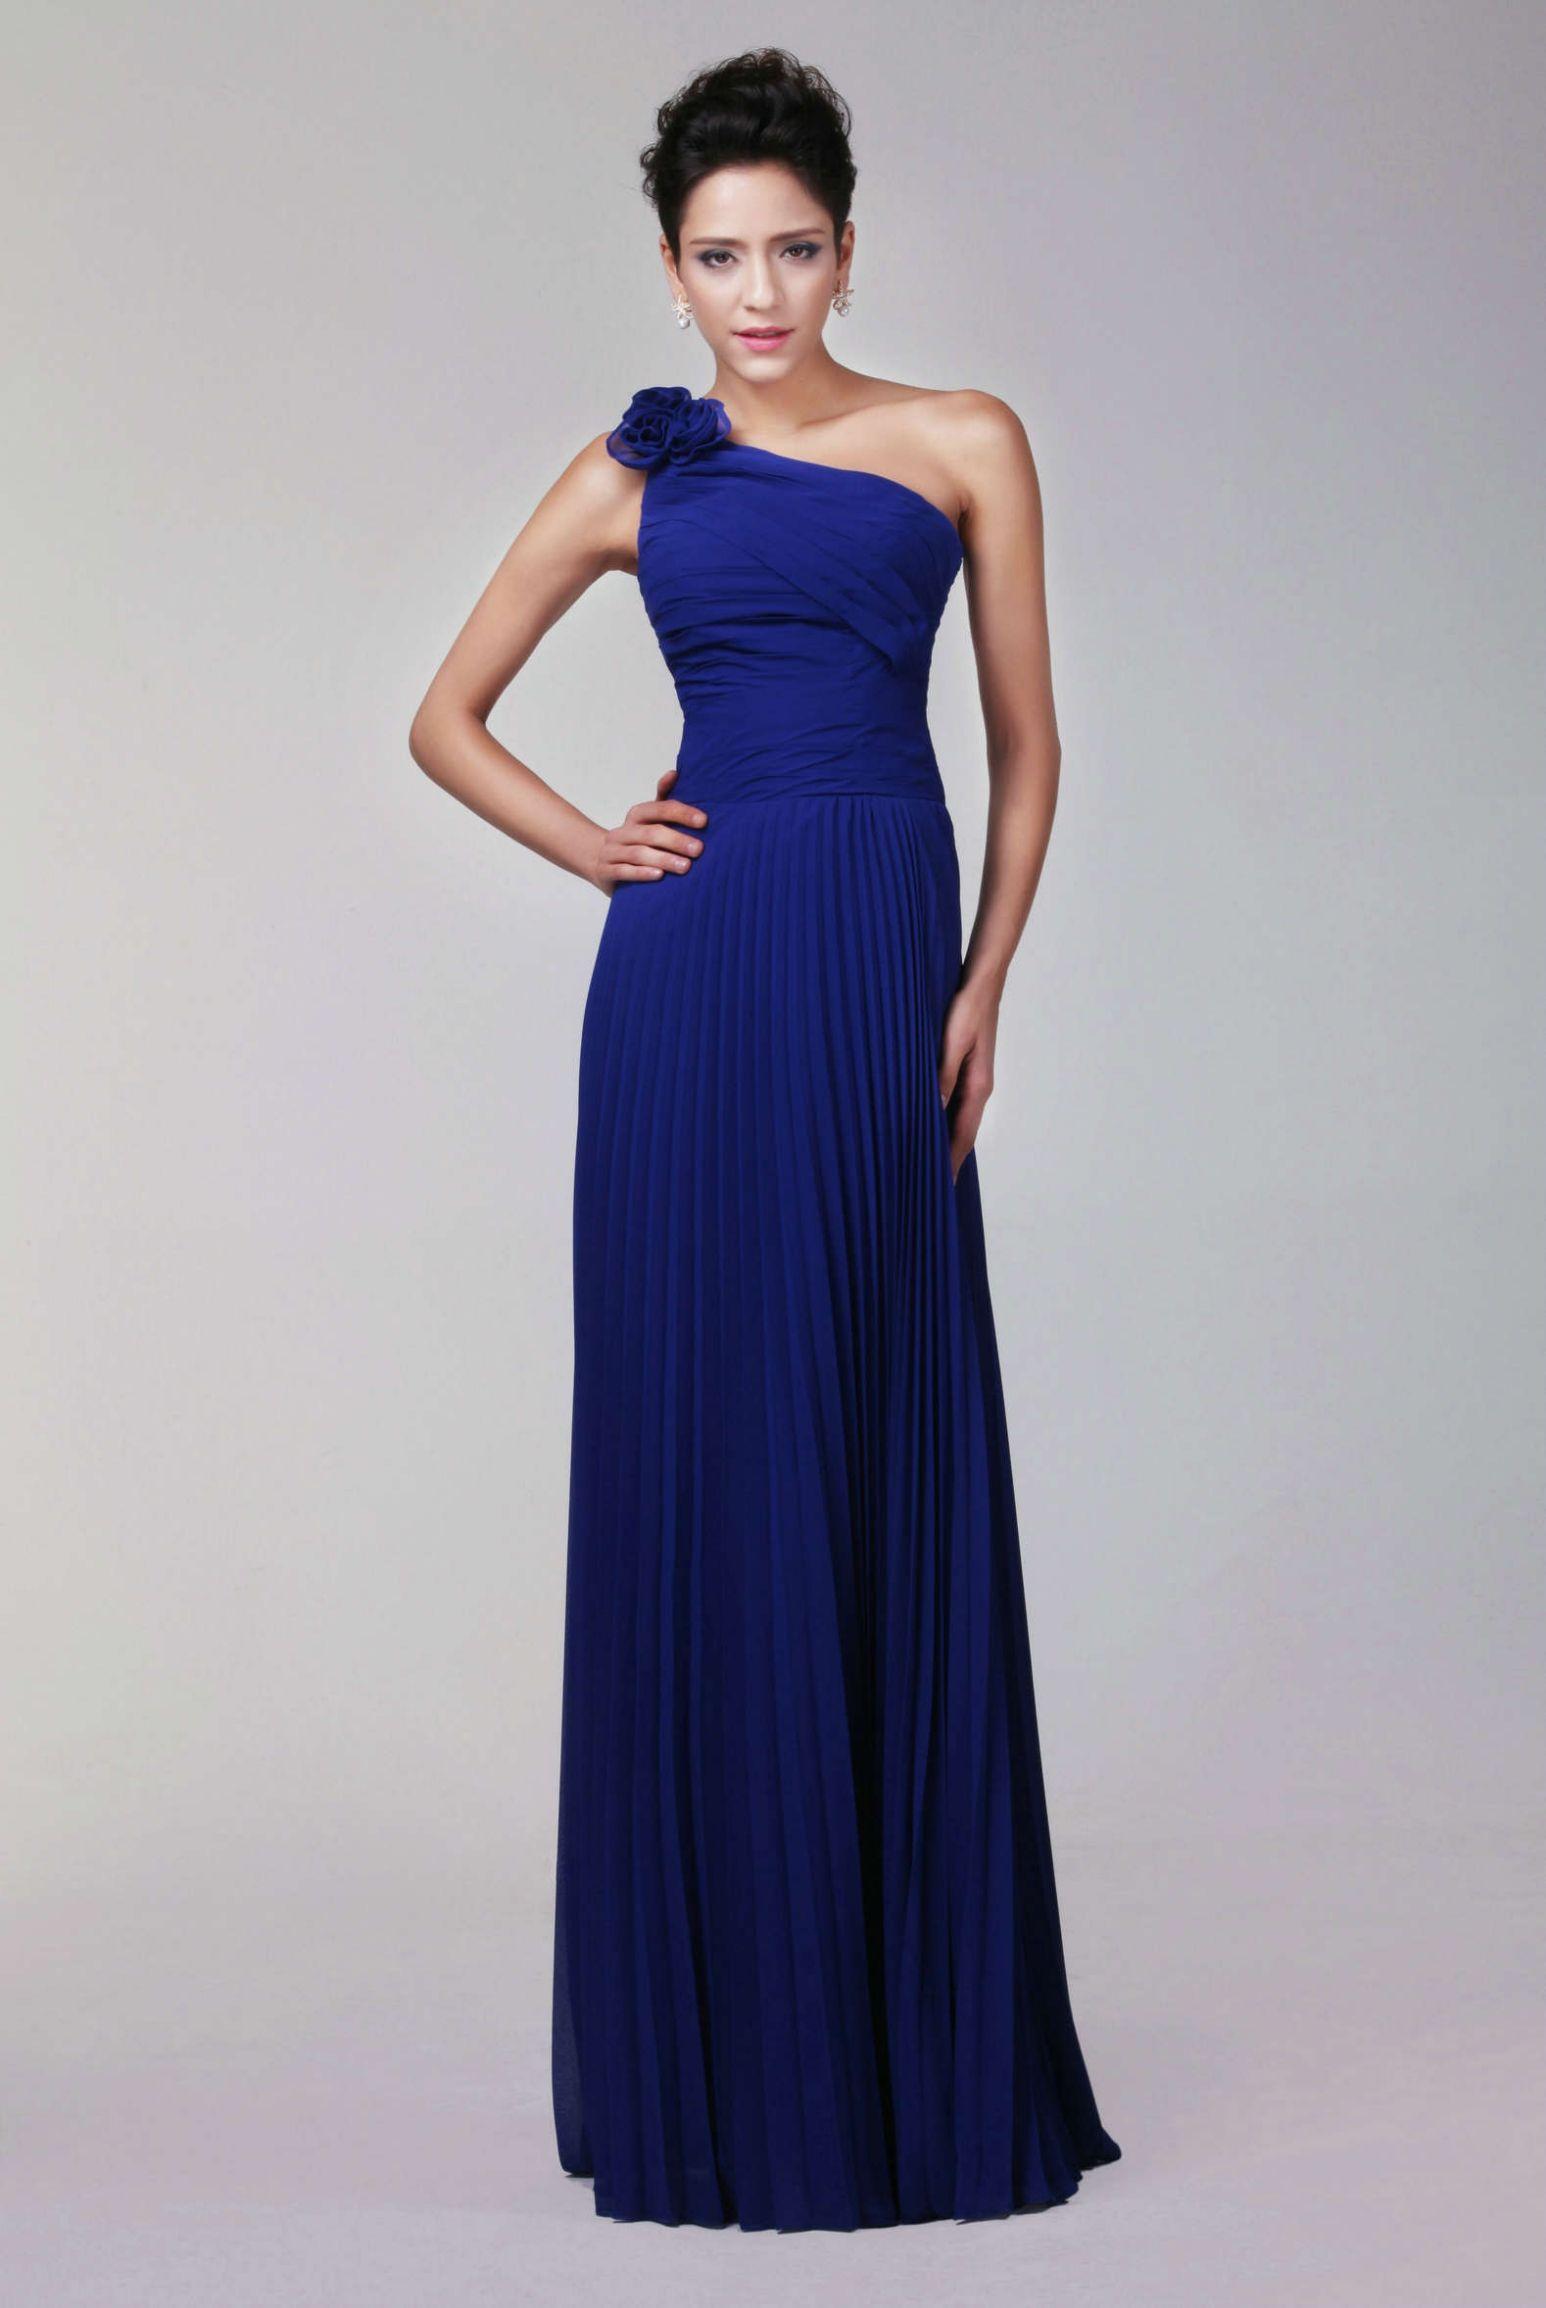 Prom dresses bridesmaid dresses blue prom dresses 2017 prom prom dresses bridesmaid dresses blue prom dresses 2017 prom dresses 2017 prom ombrellifo Gallery